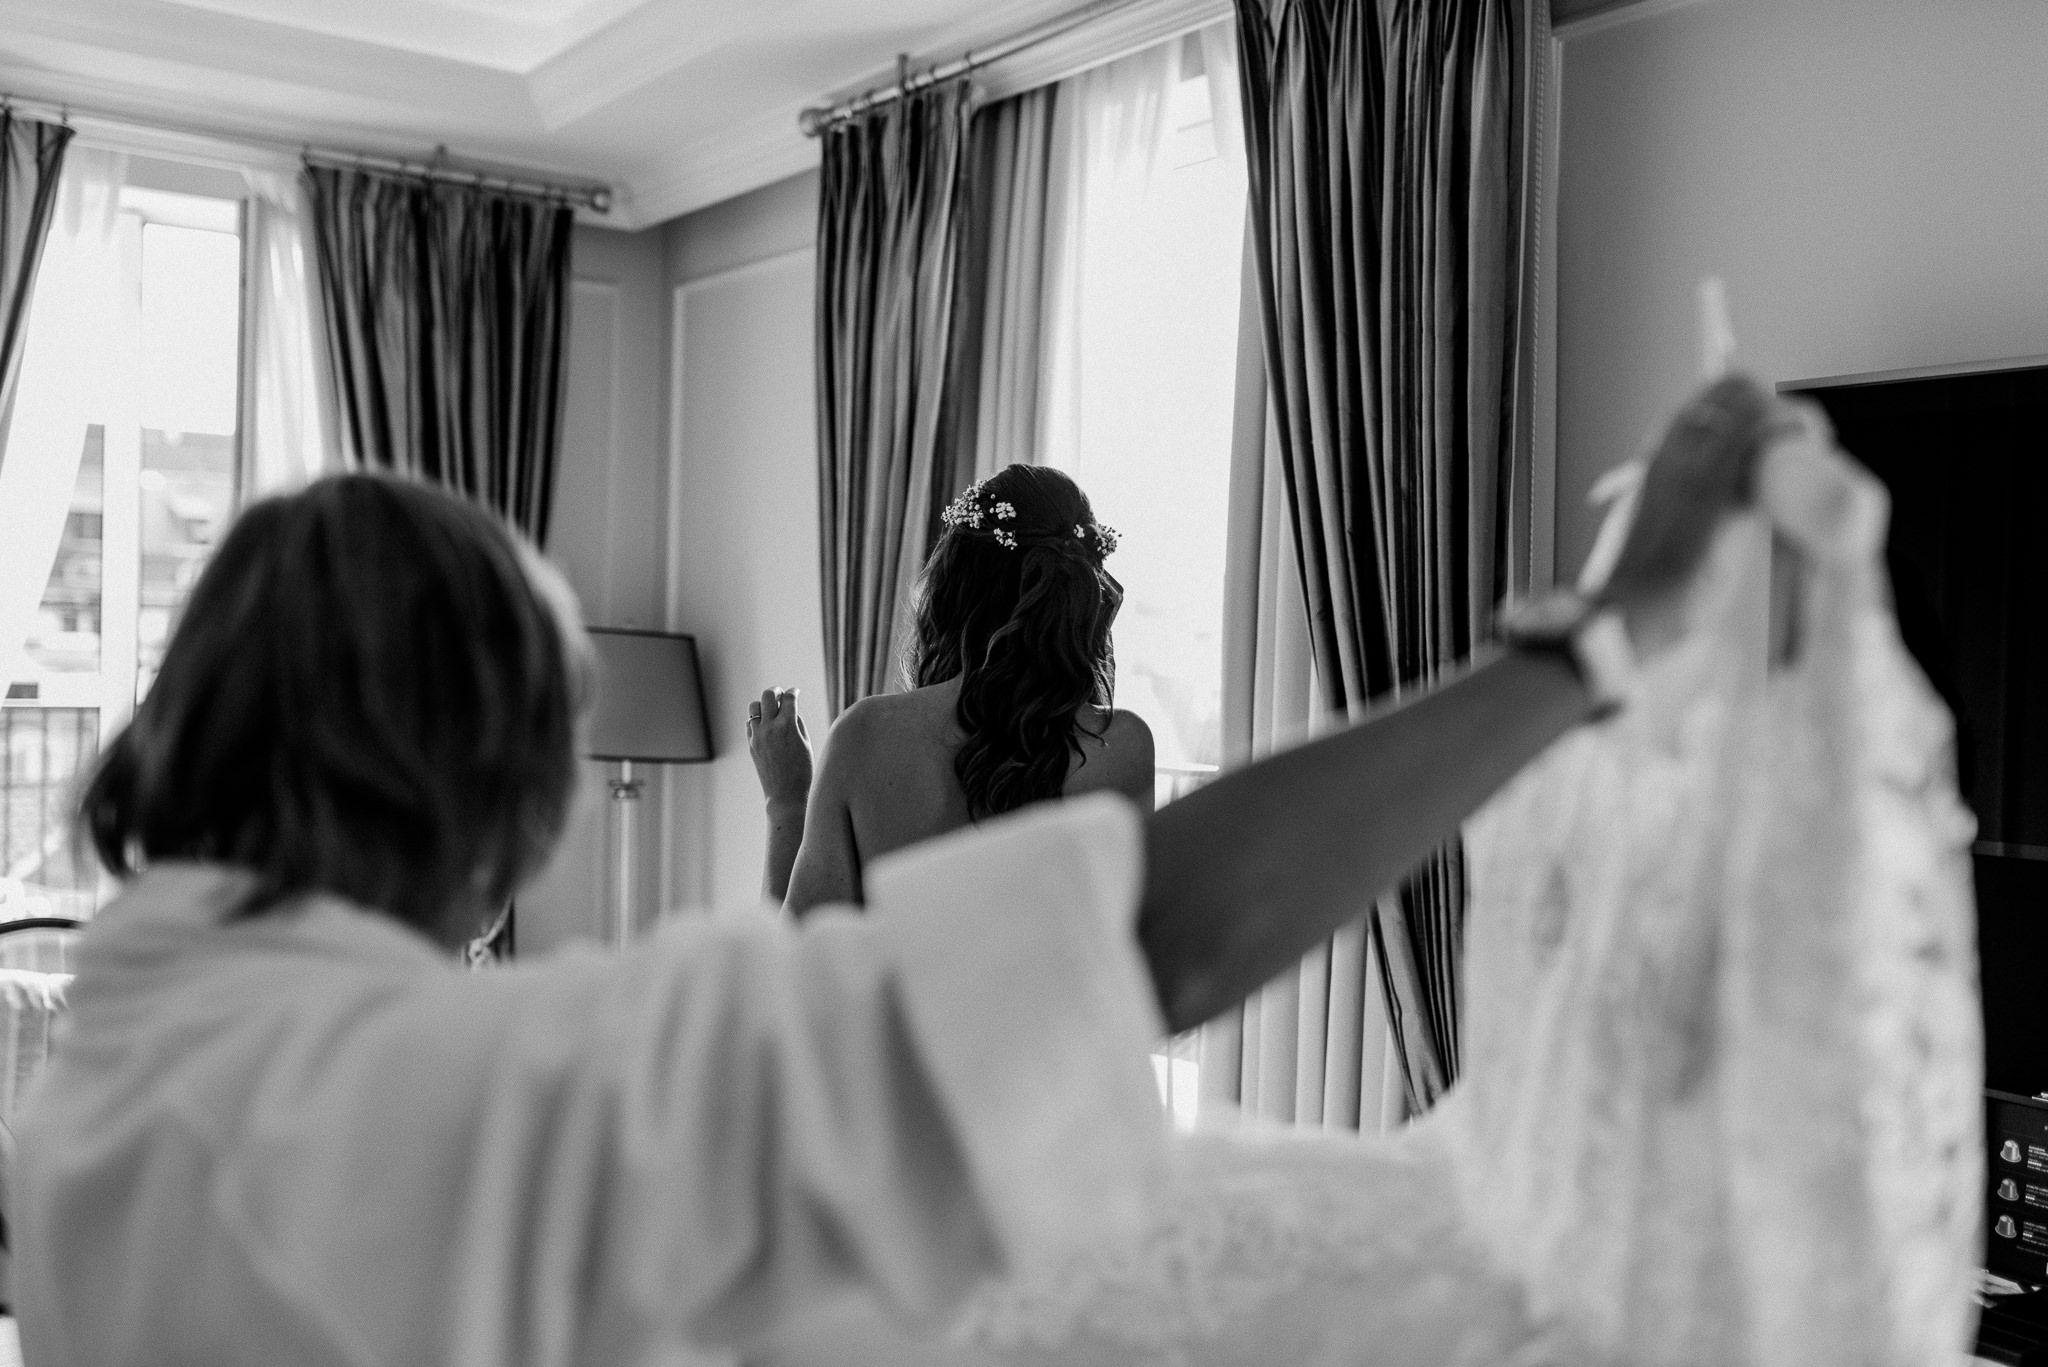 copenhagen-wedding-photographer-1.jpg